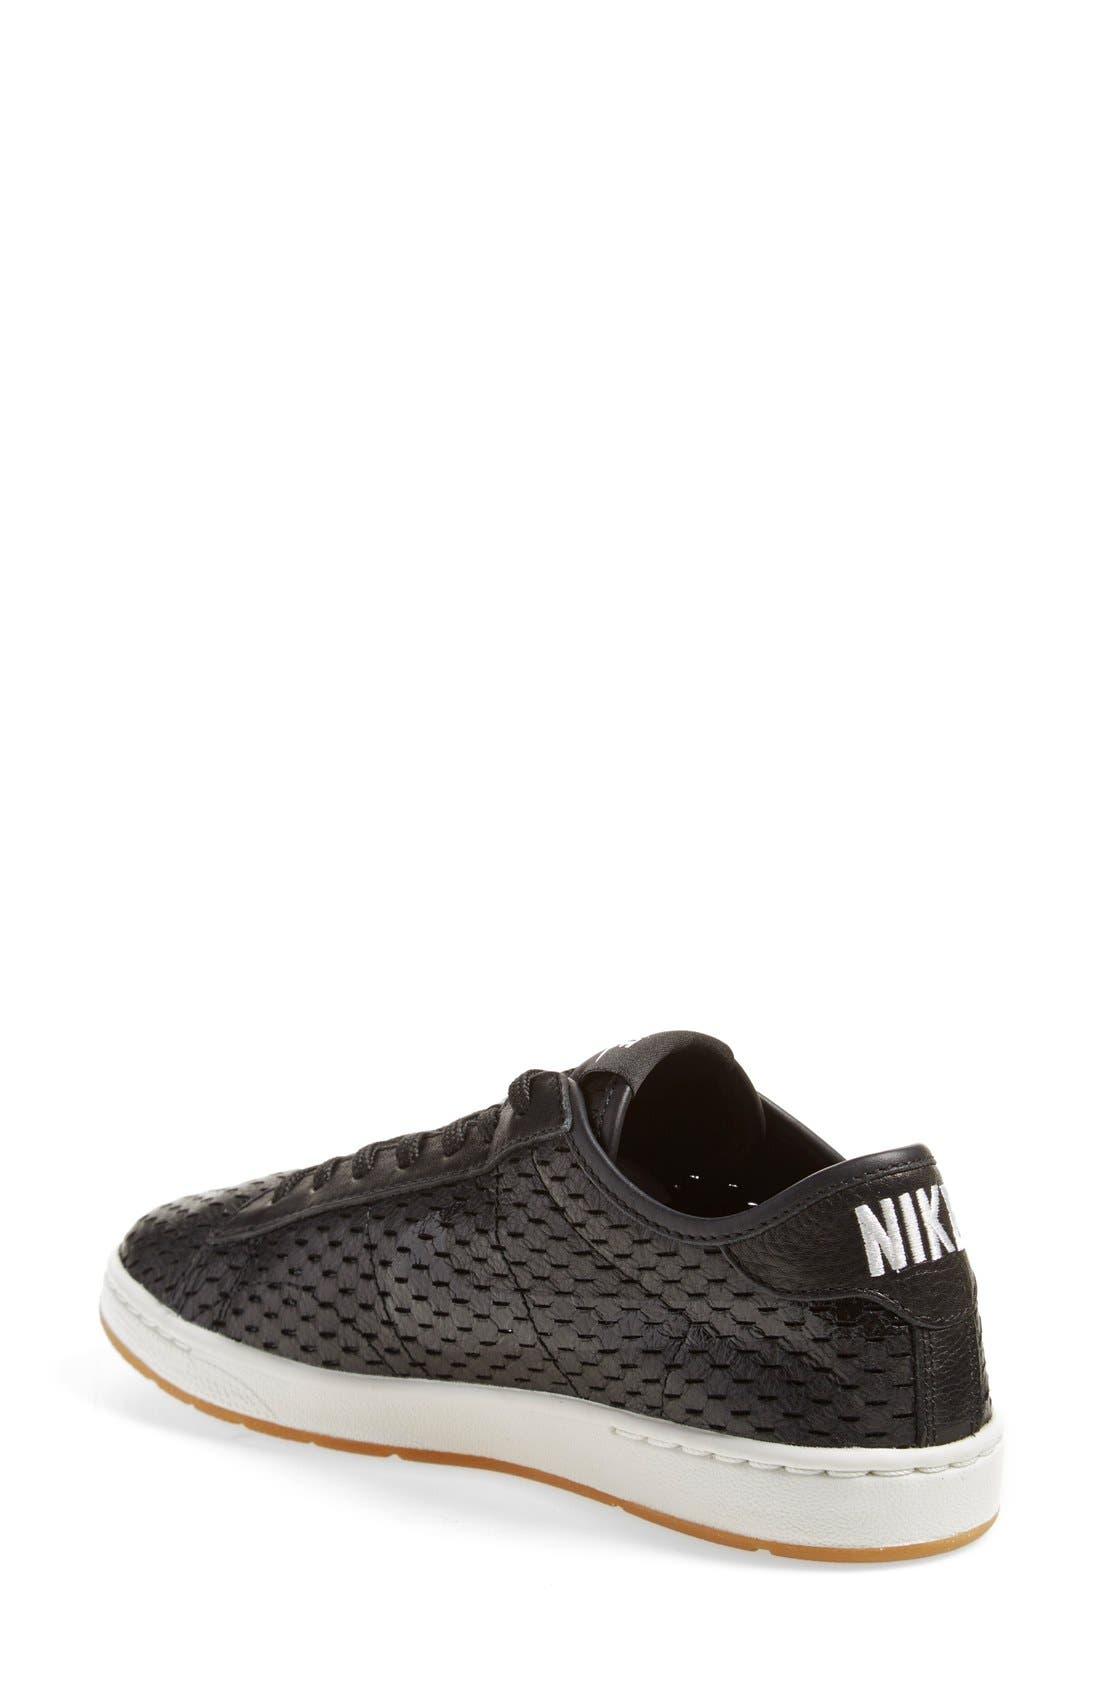 Alternate Image 2  - Nike 'Tennis Classic Ultra' Sneaker (Women)